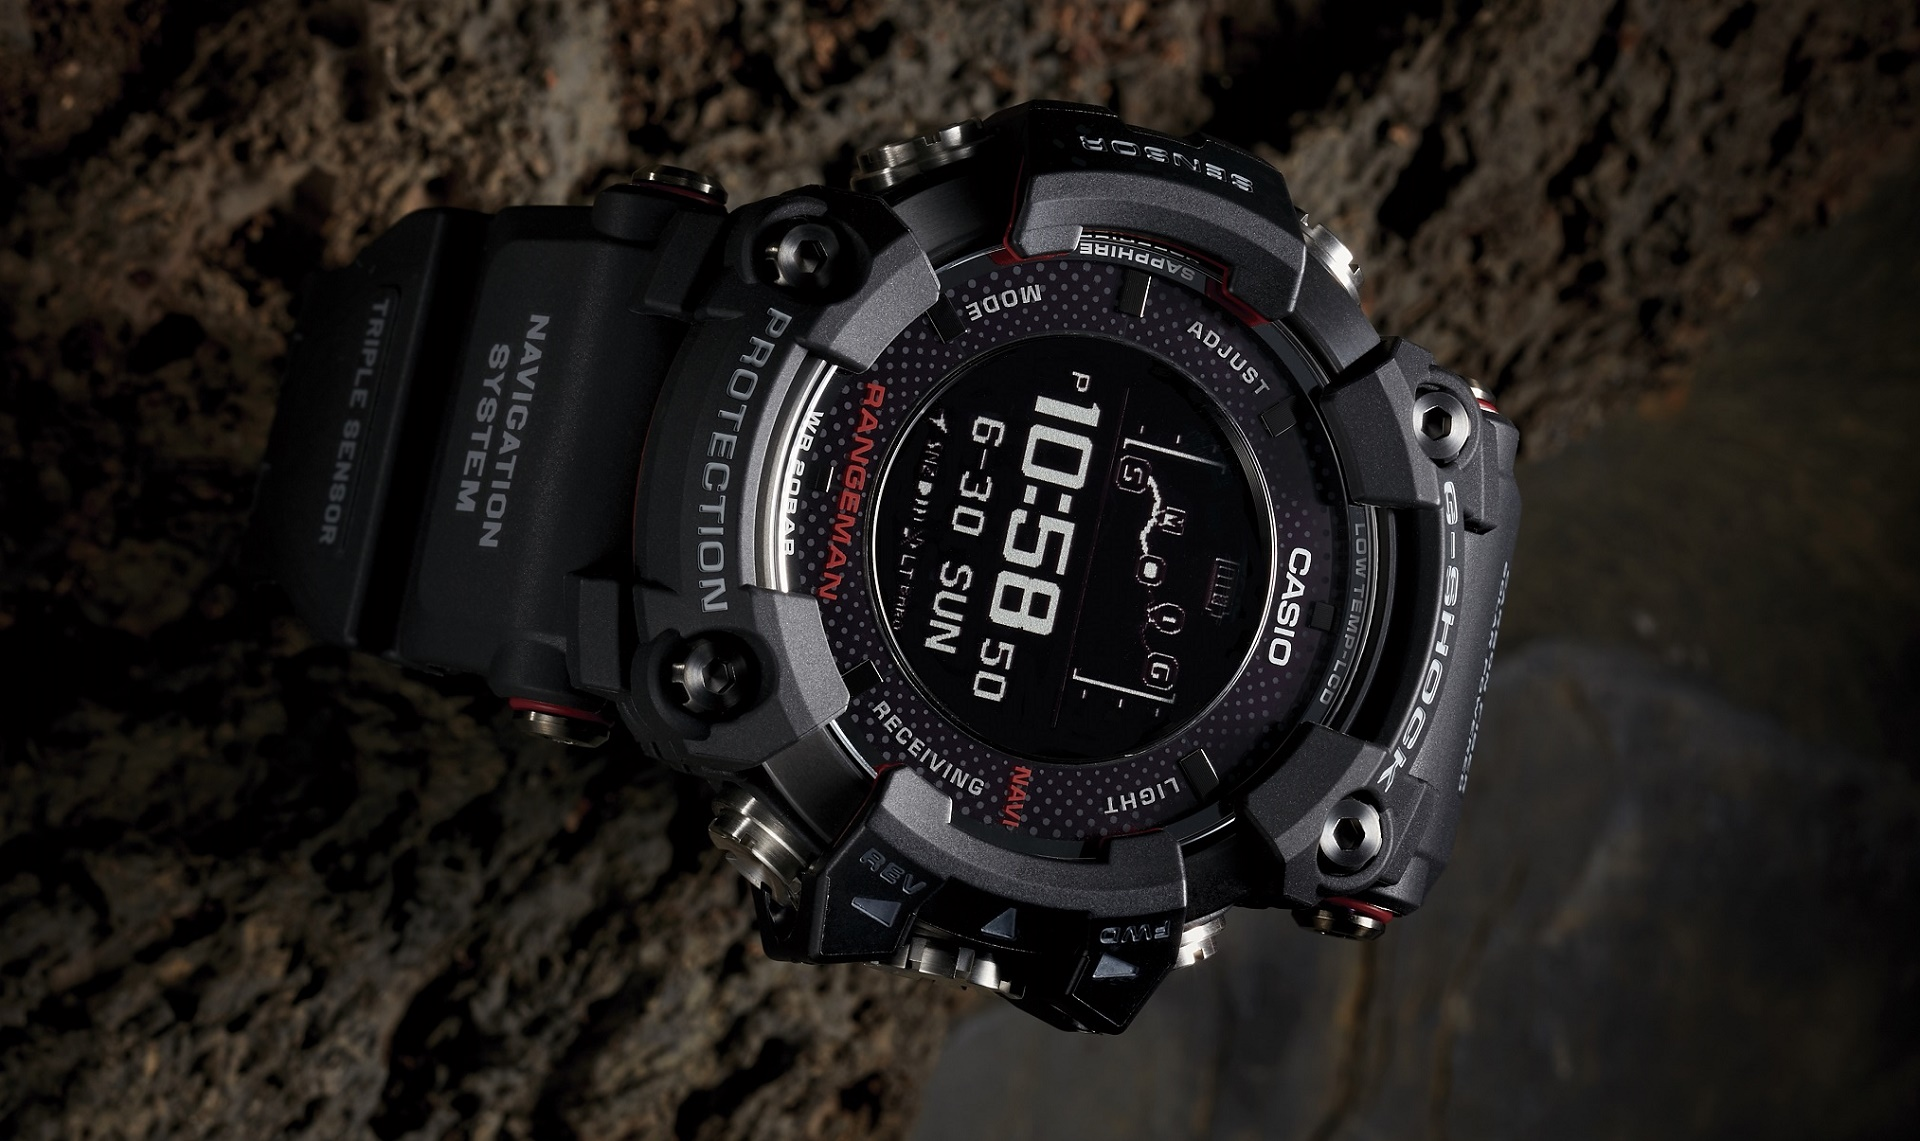 New Upgraded Refined Casio G Shock Rangeman Gpr B1000 Watch Gshock Original Gw 9400 1adr Gw9400 Ablogtowatch